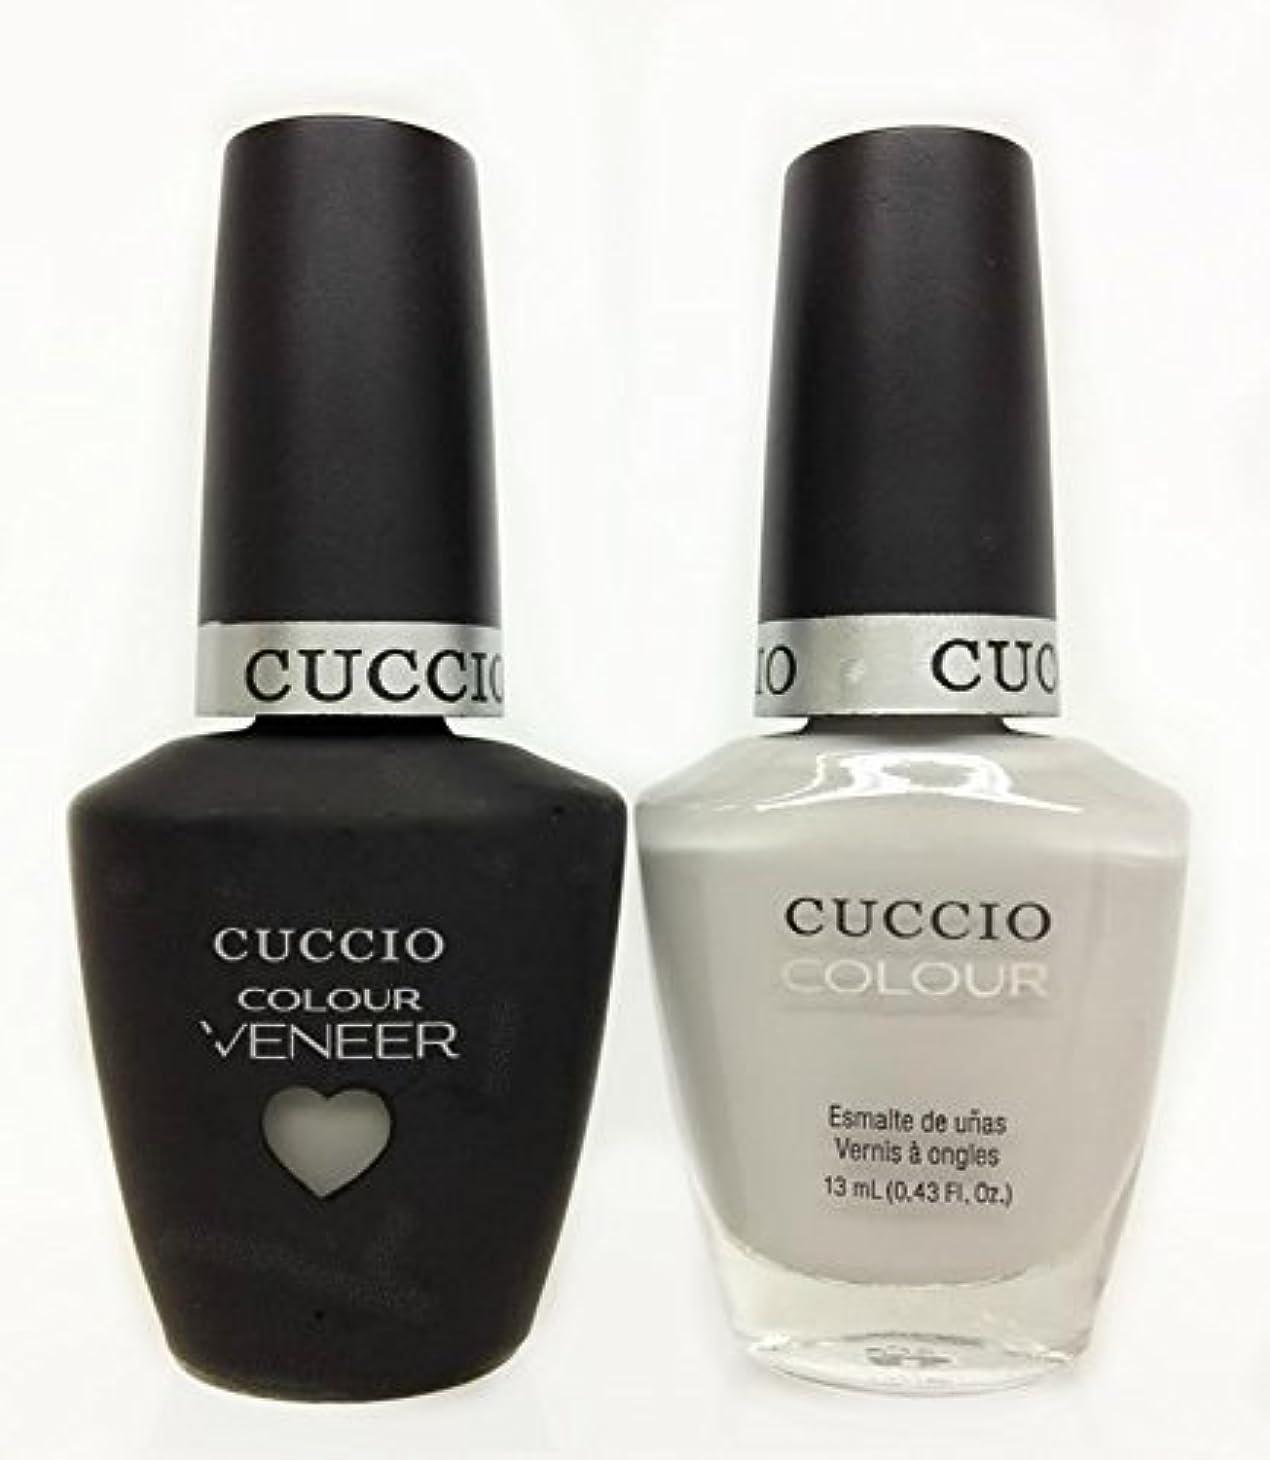 申請中行男Cuccio MatchMakers Veneer & Lacquer - Quick as a Bunny - 0.43oz / 13ml Each